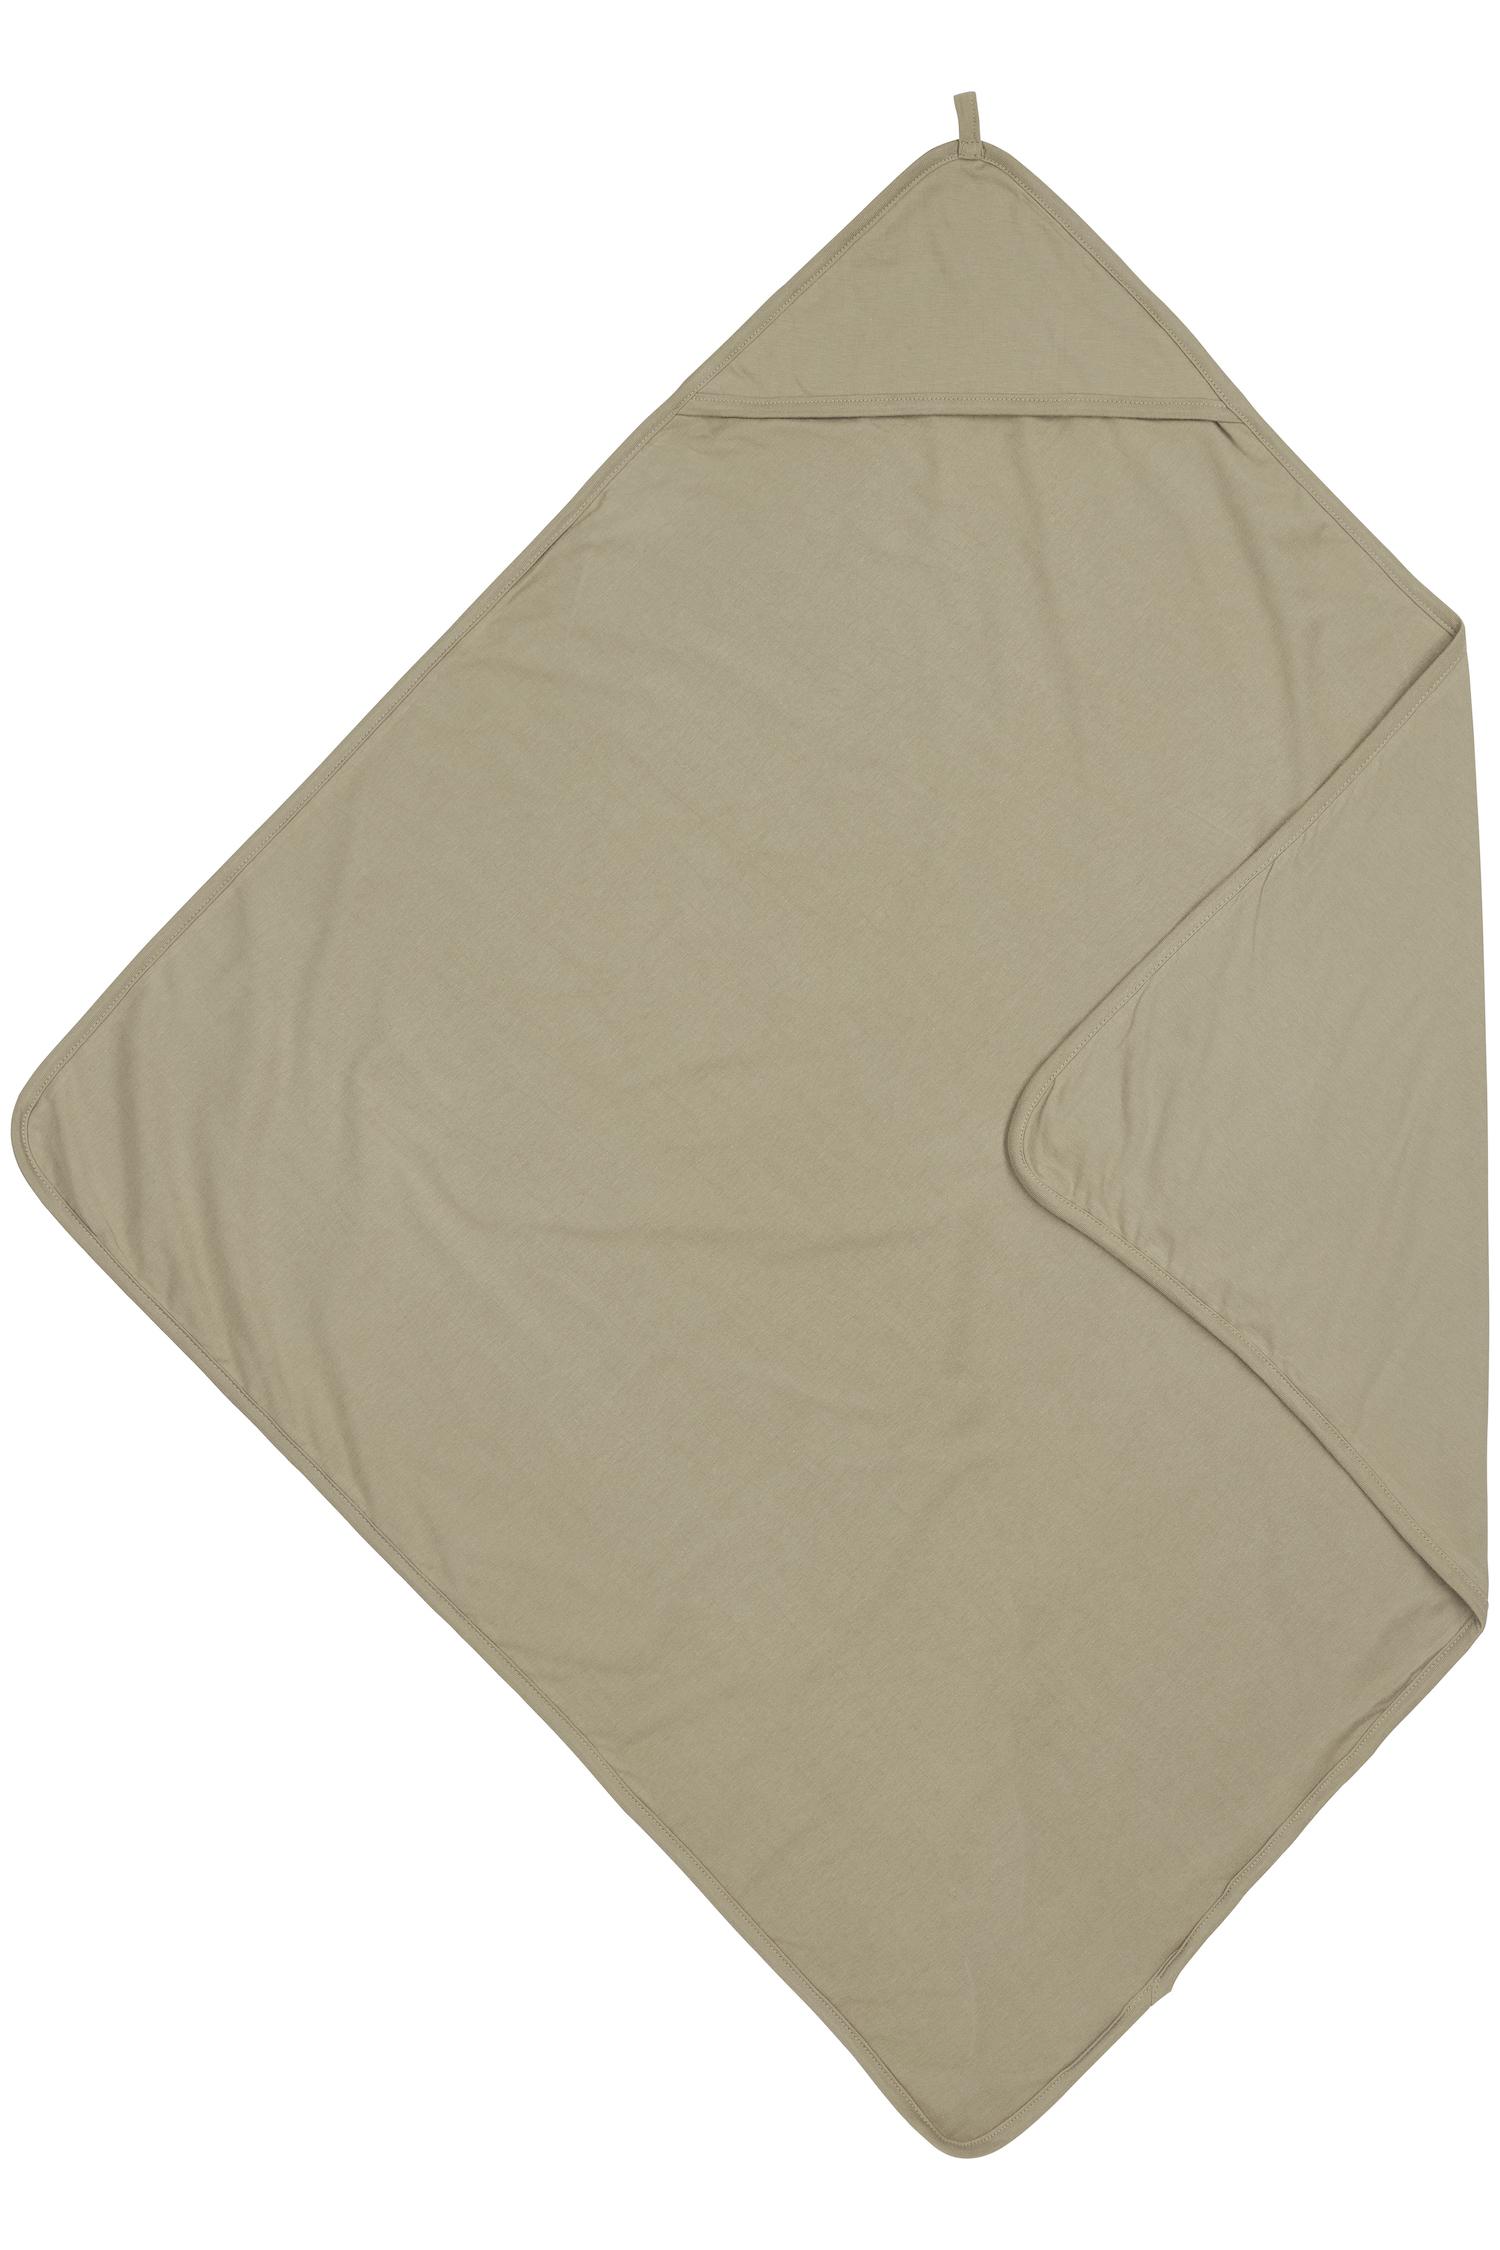 Kapuzentuch Basic Jersey - Taupe - 80x80cm